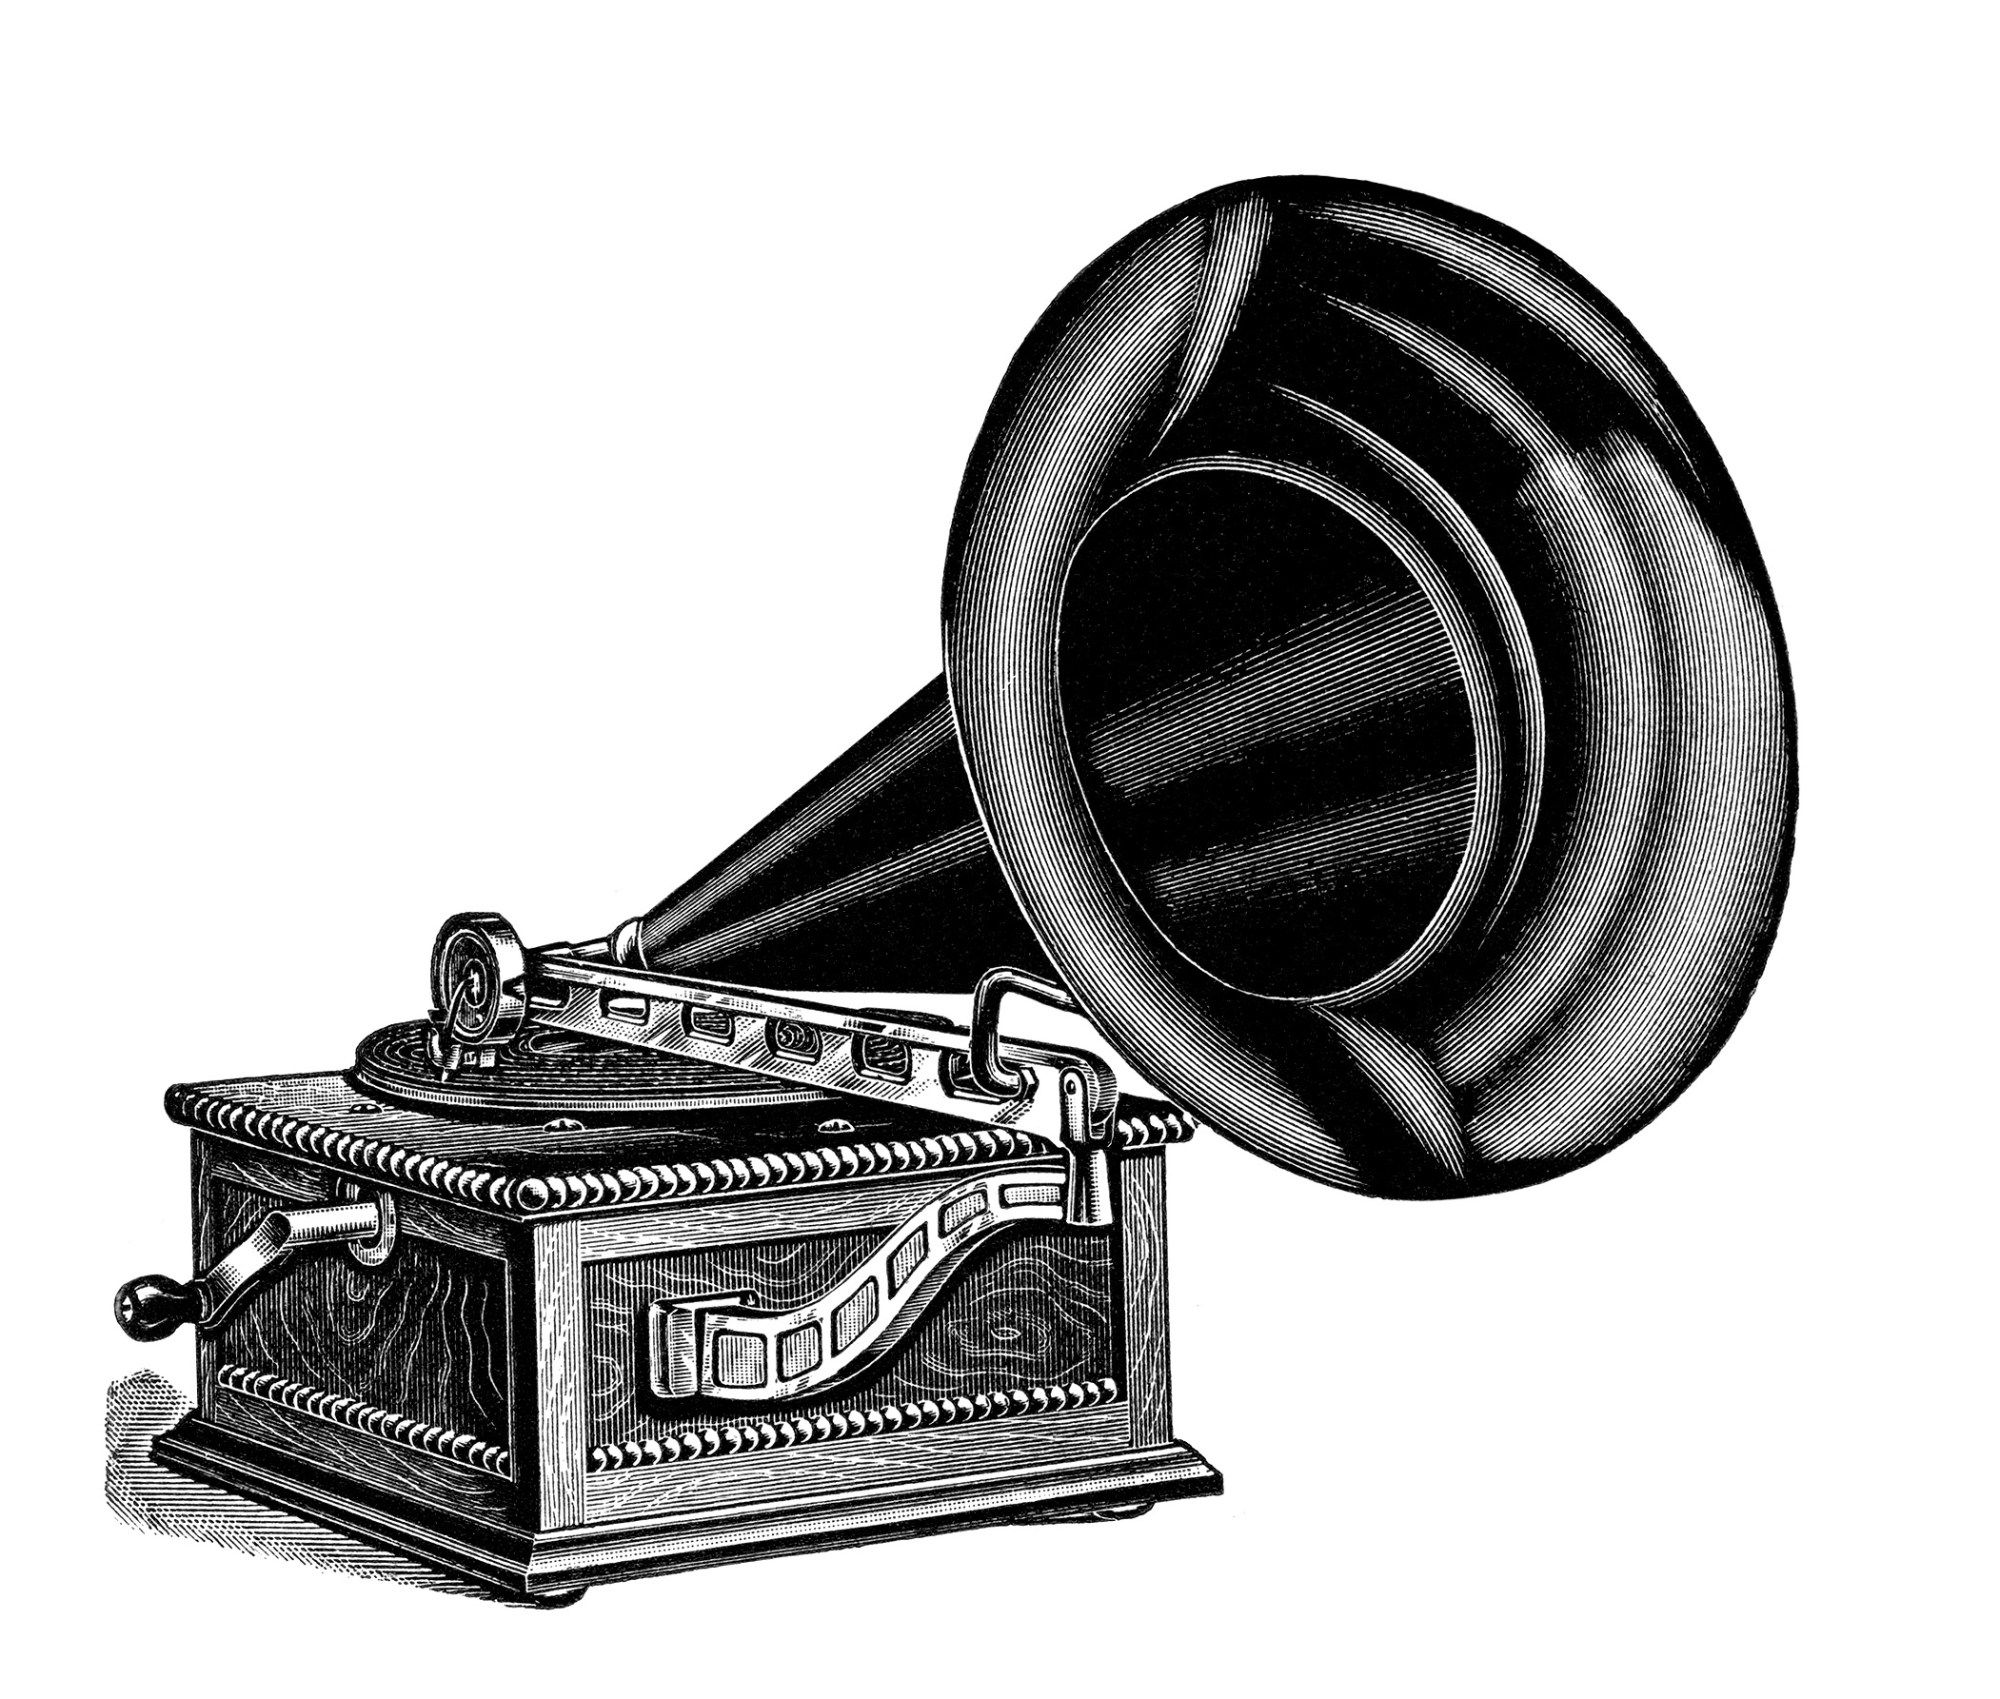 talking machine clip art, vintage gramophone image, black ...